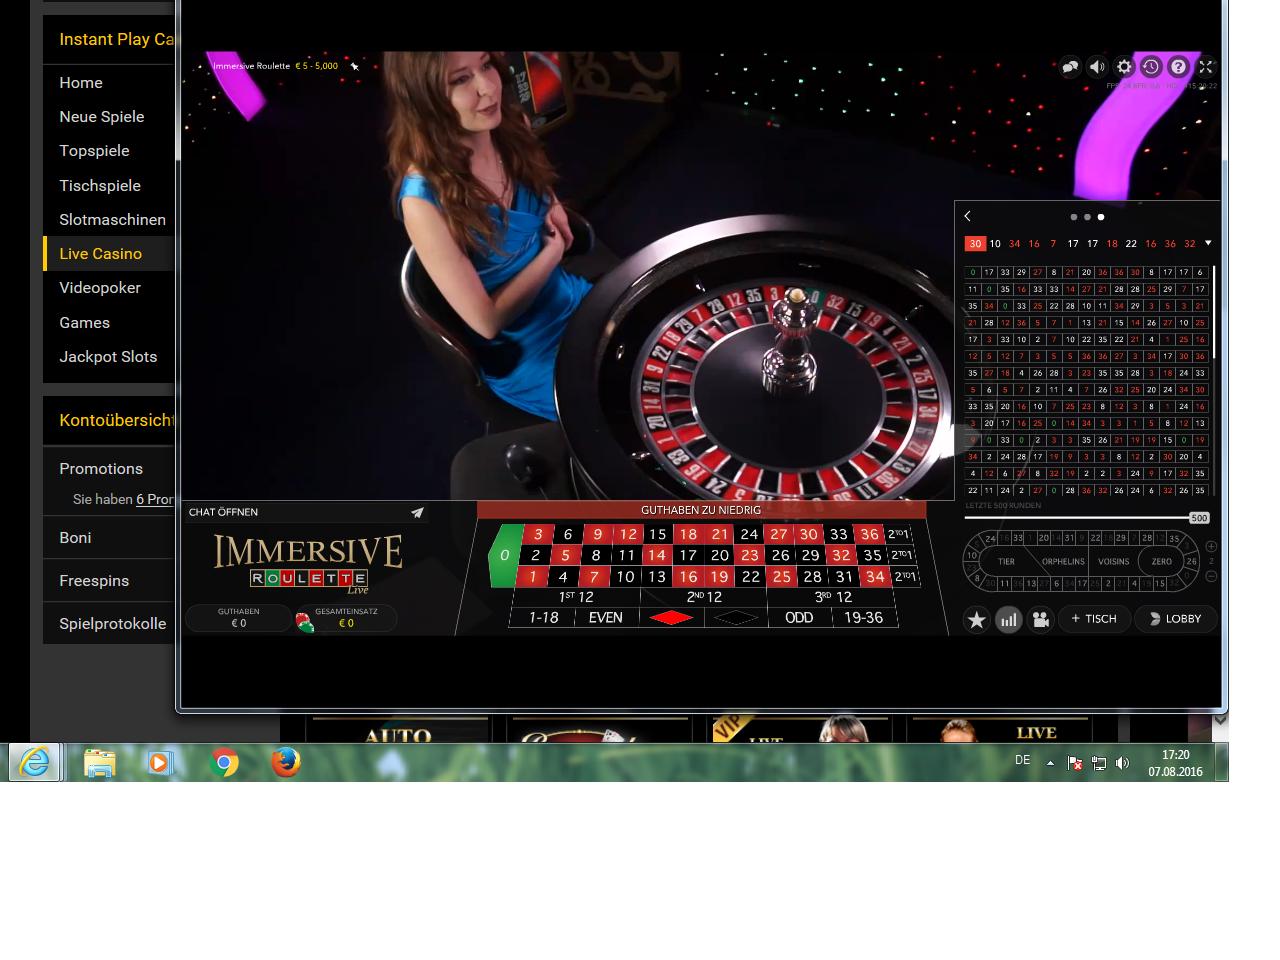 double down casino mod apk